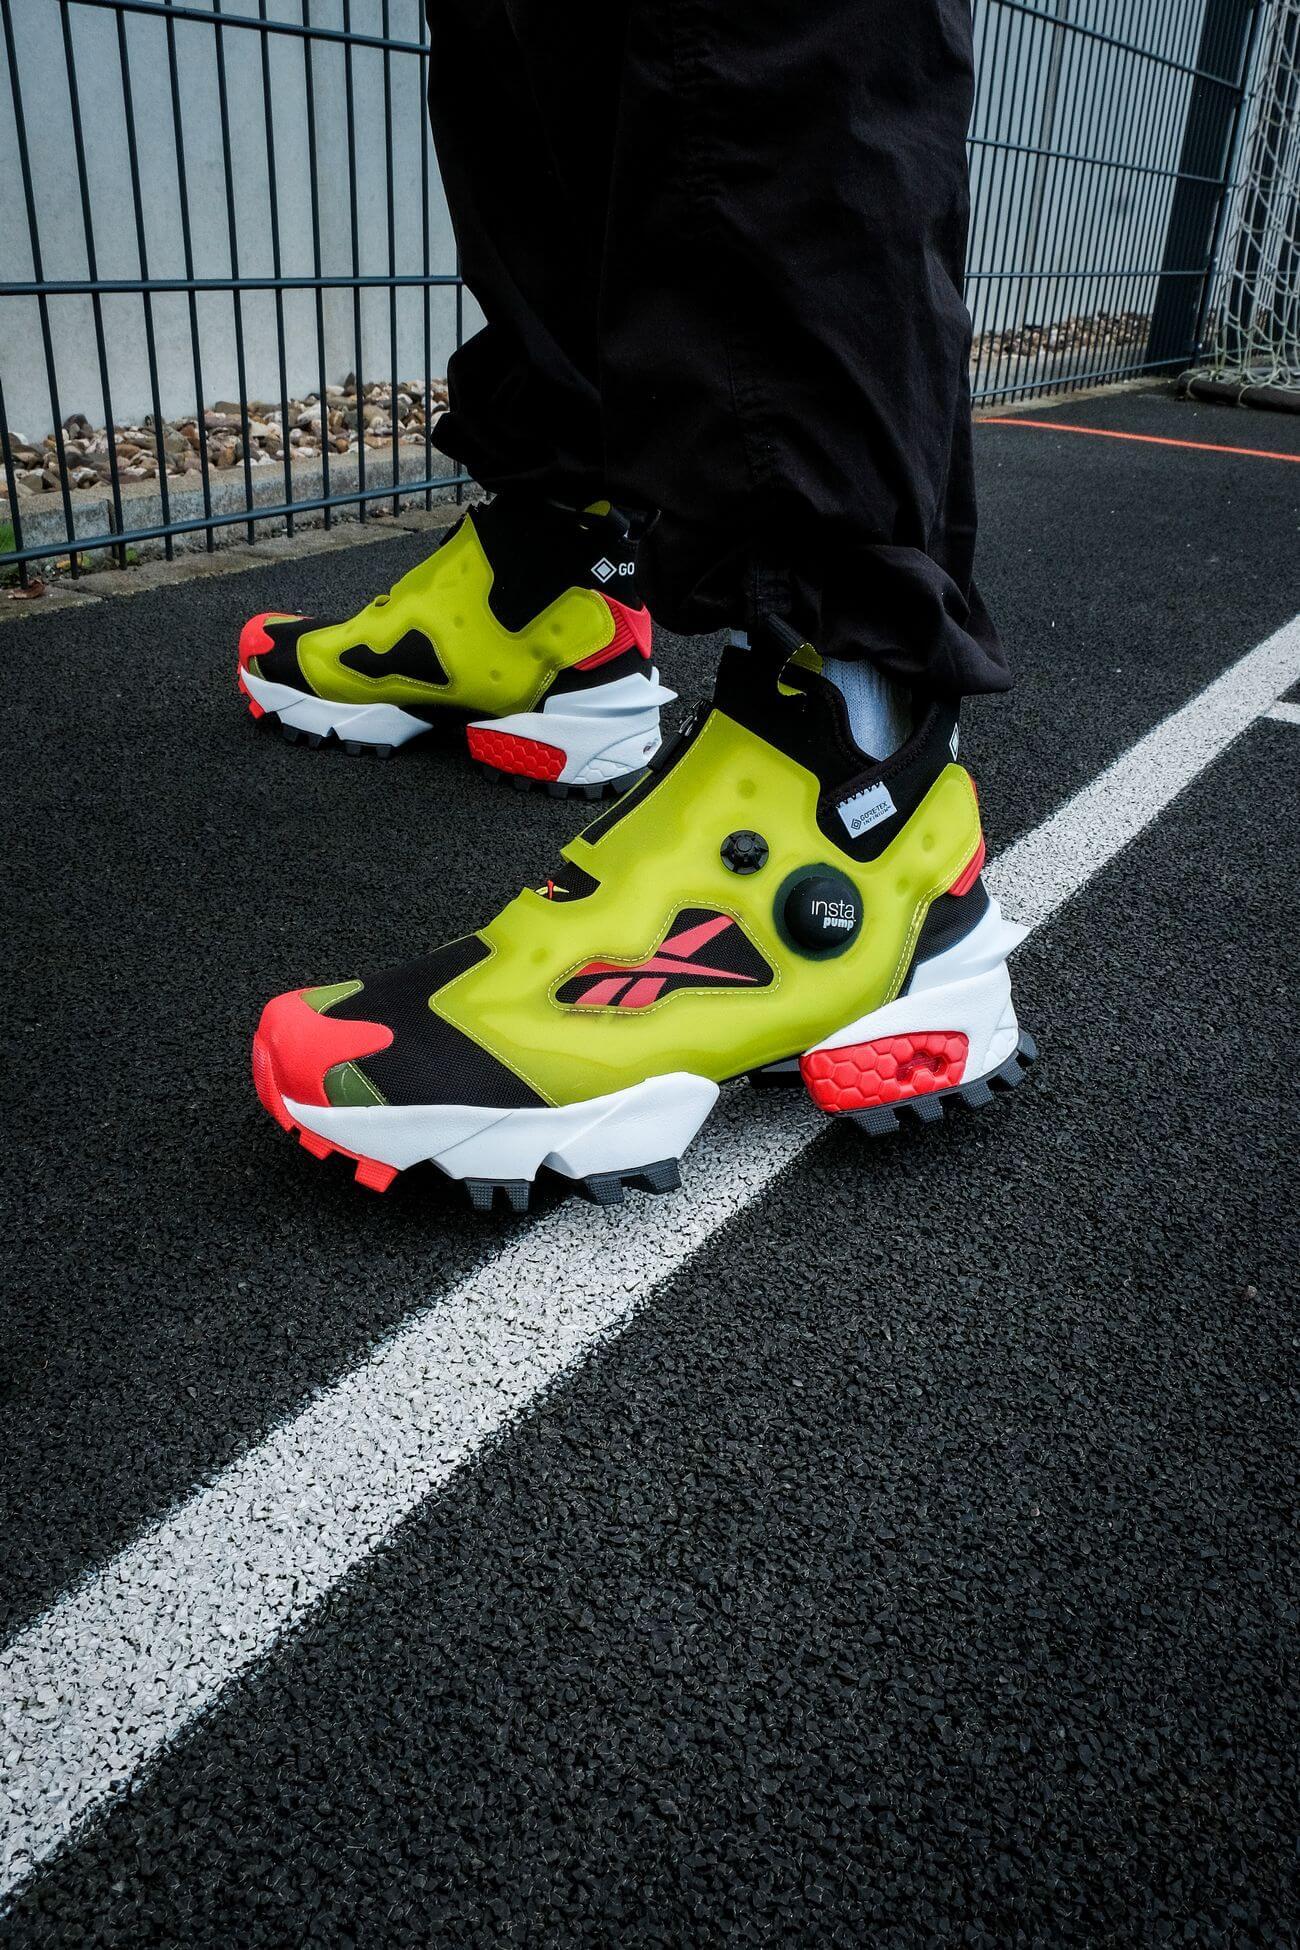 on feet - Reebok - Insta Pump Fury OG Hi Gore-Tex Infinium - black/acid yellow/vector red - S23866